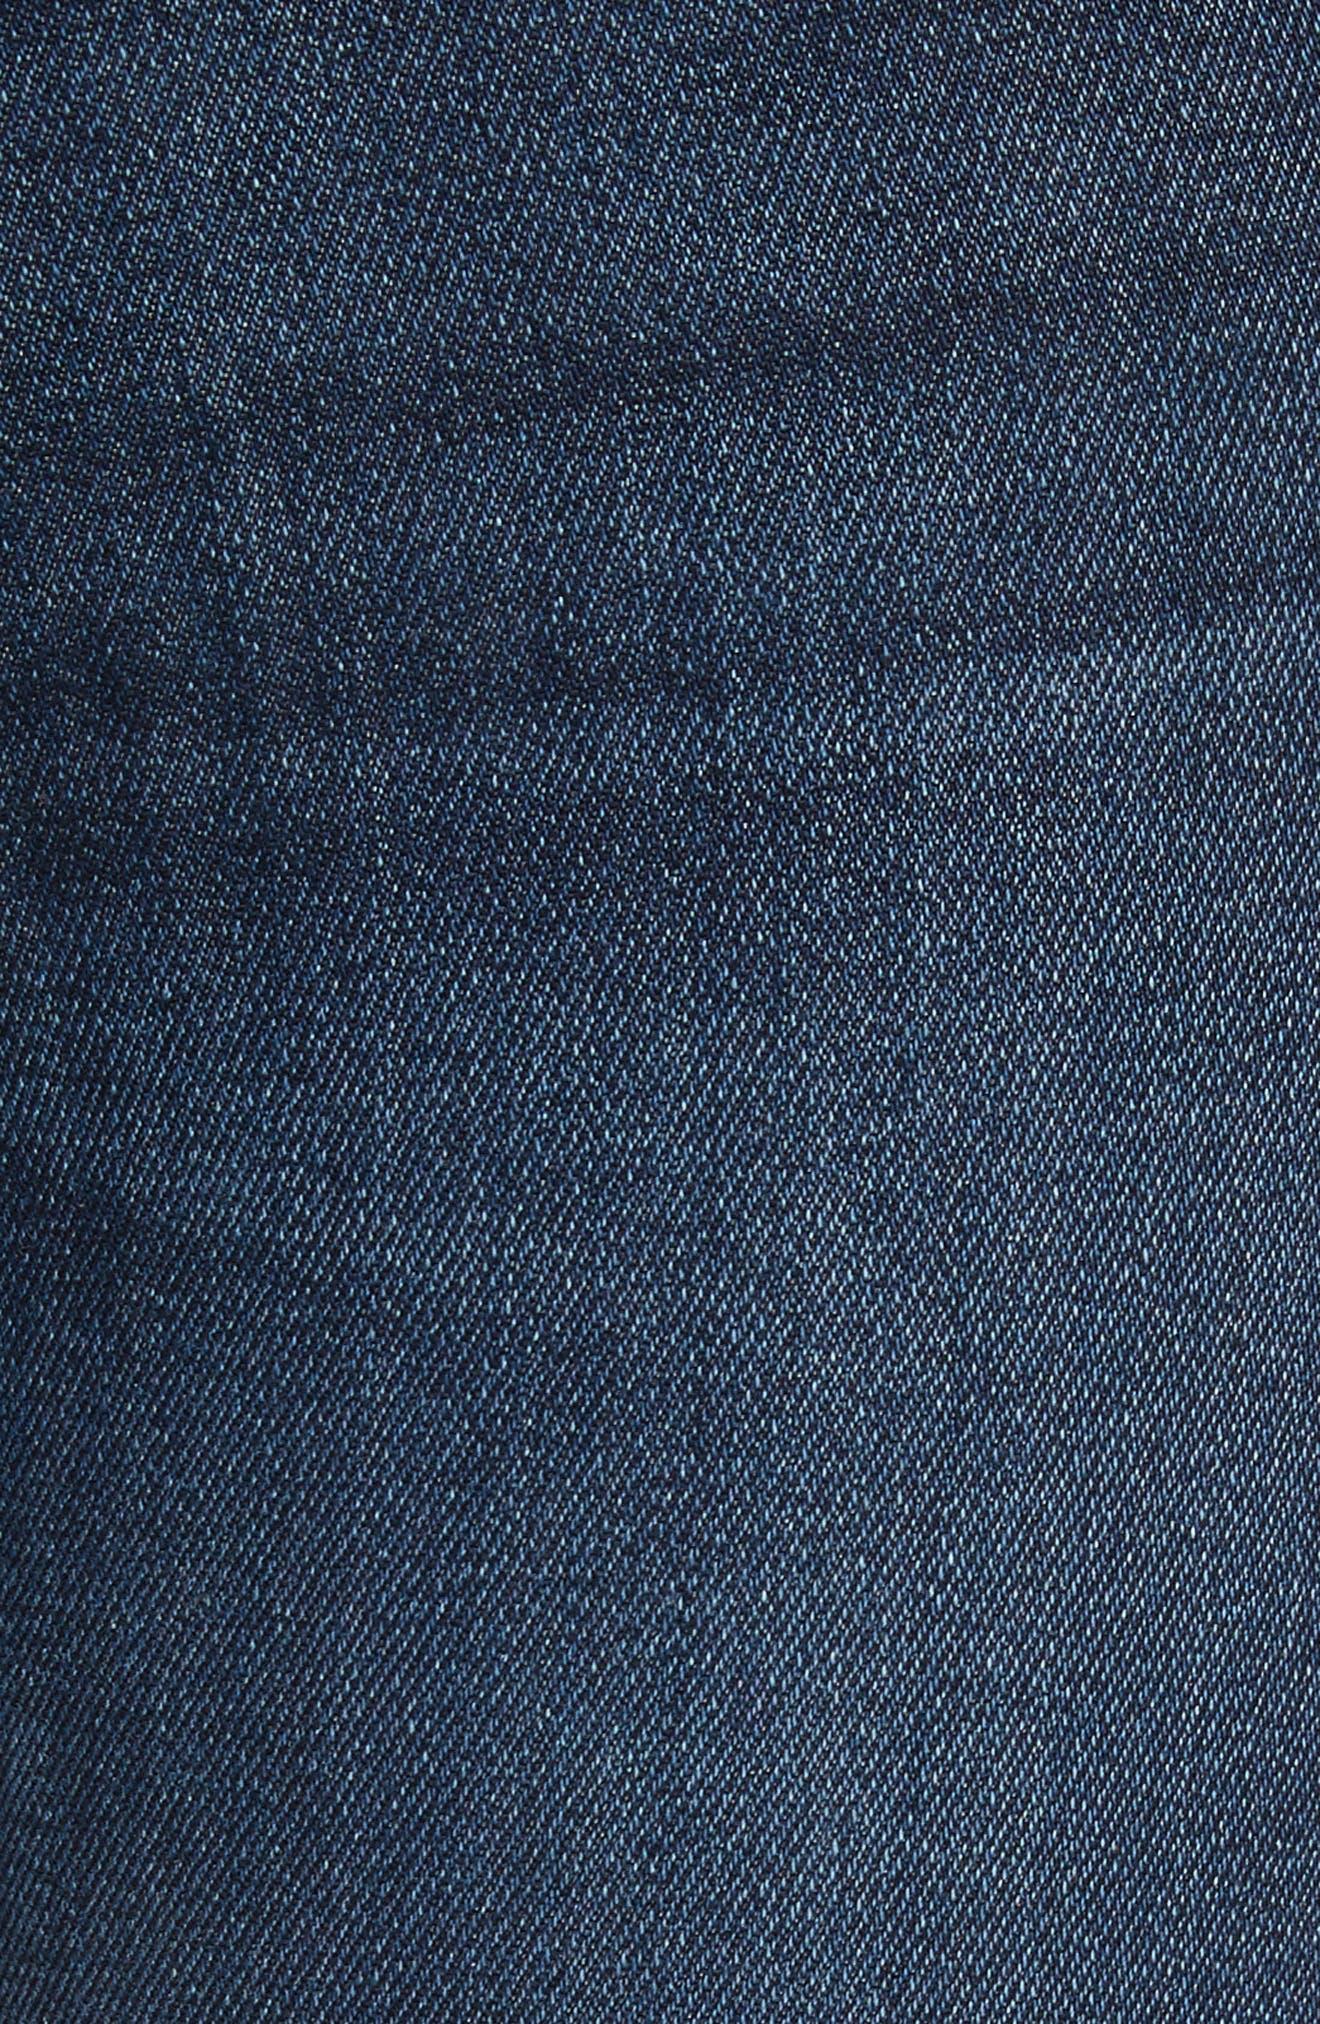 High Waist Skinny Jeans,                             Alternate thumbnail 5, color,                             404